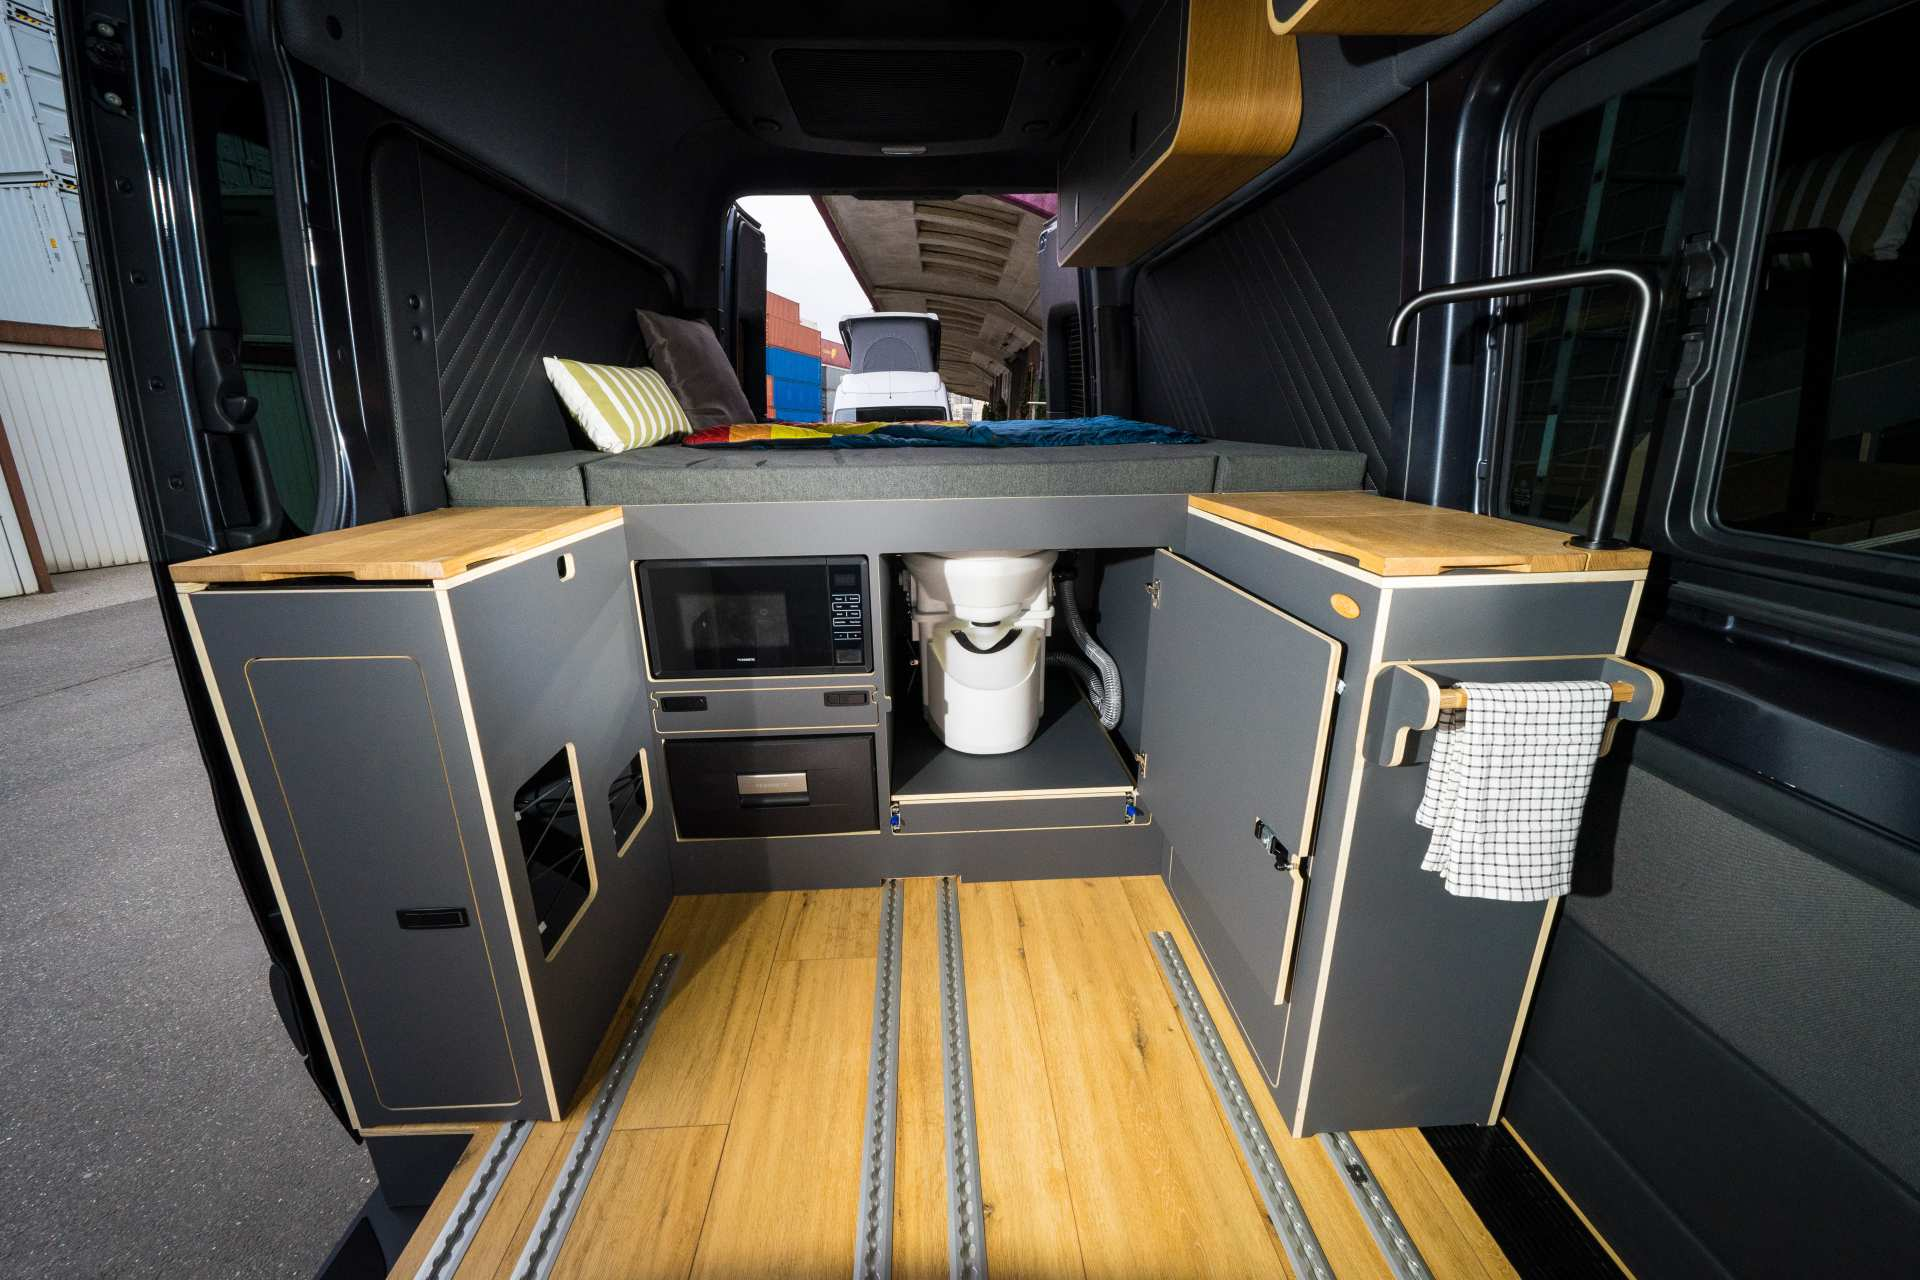 Individualausbau: Mercedes L2 H2 Mixto - 11